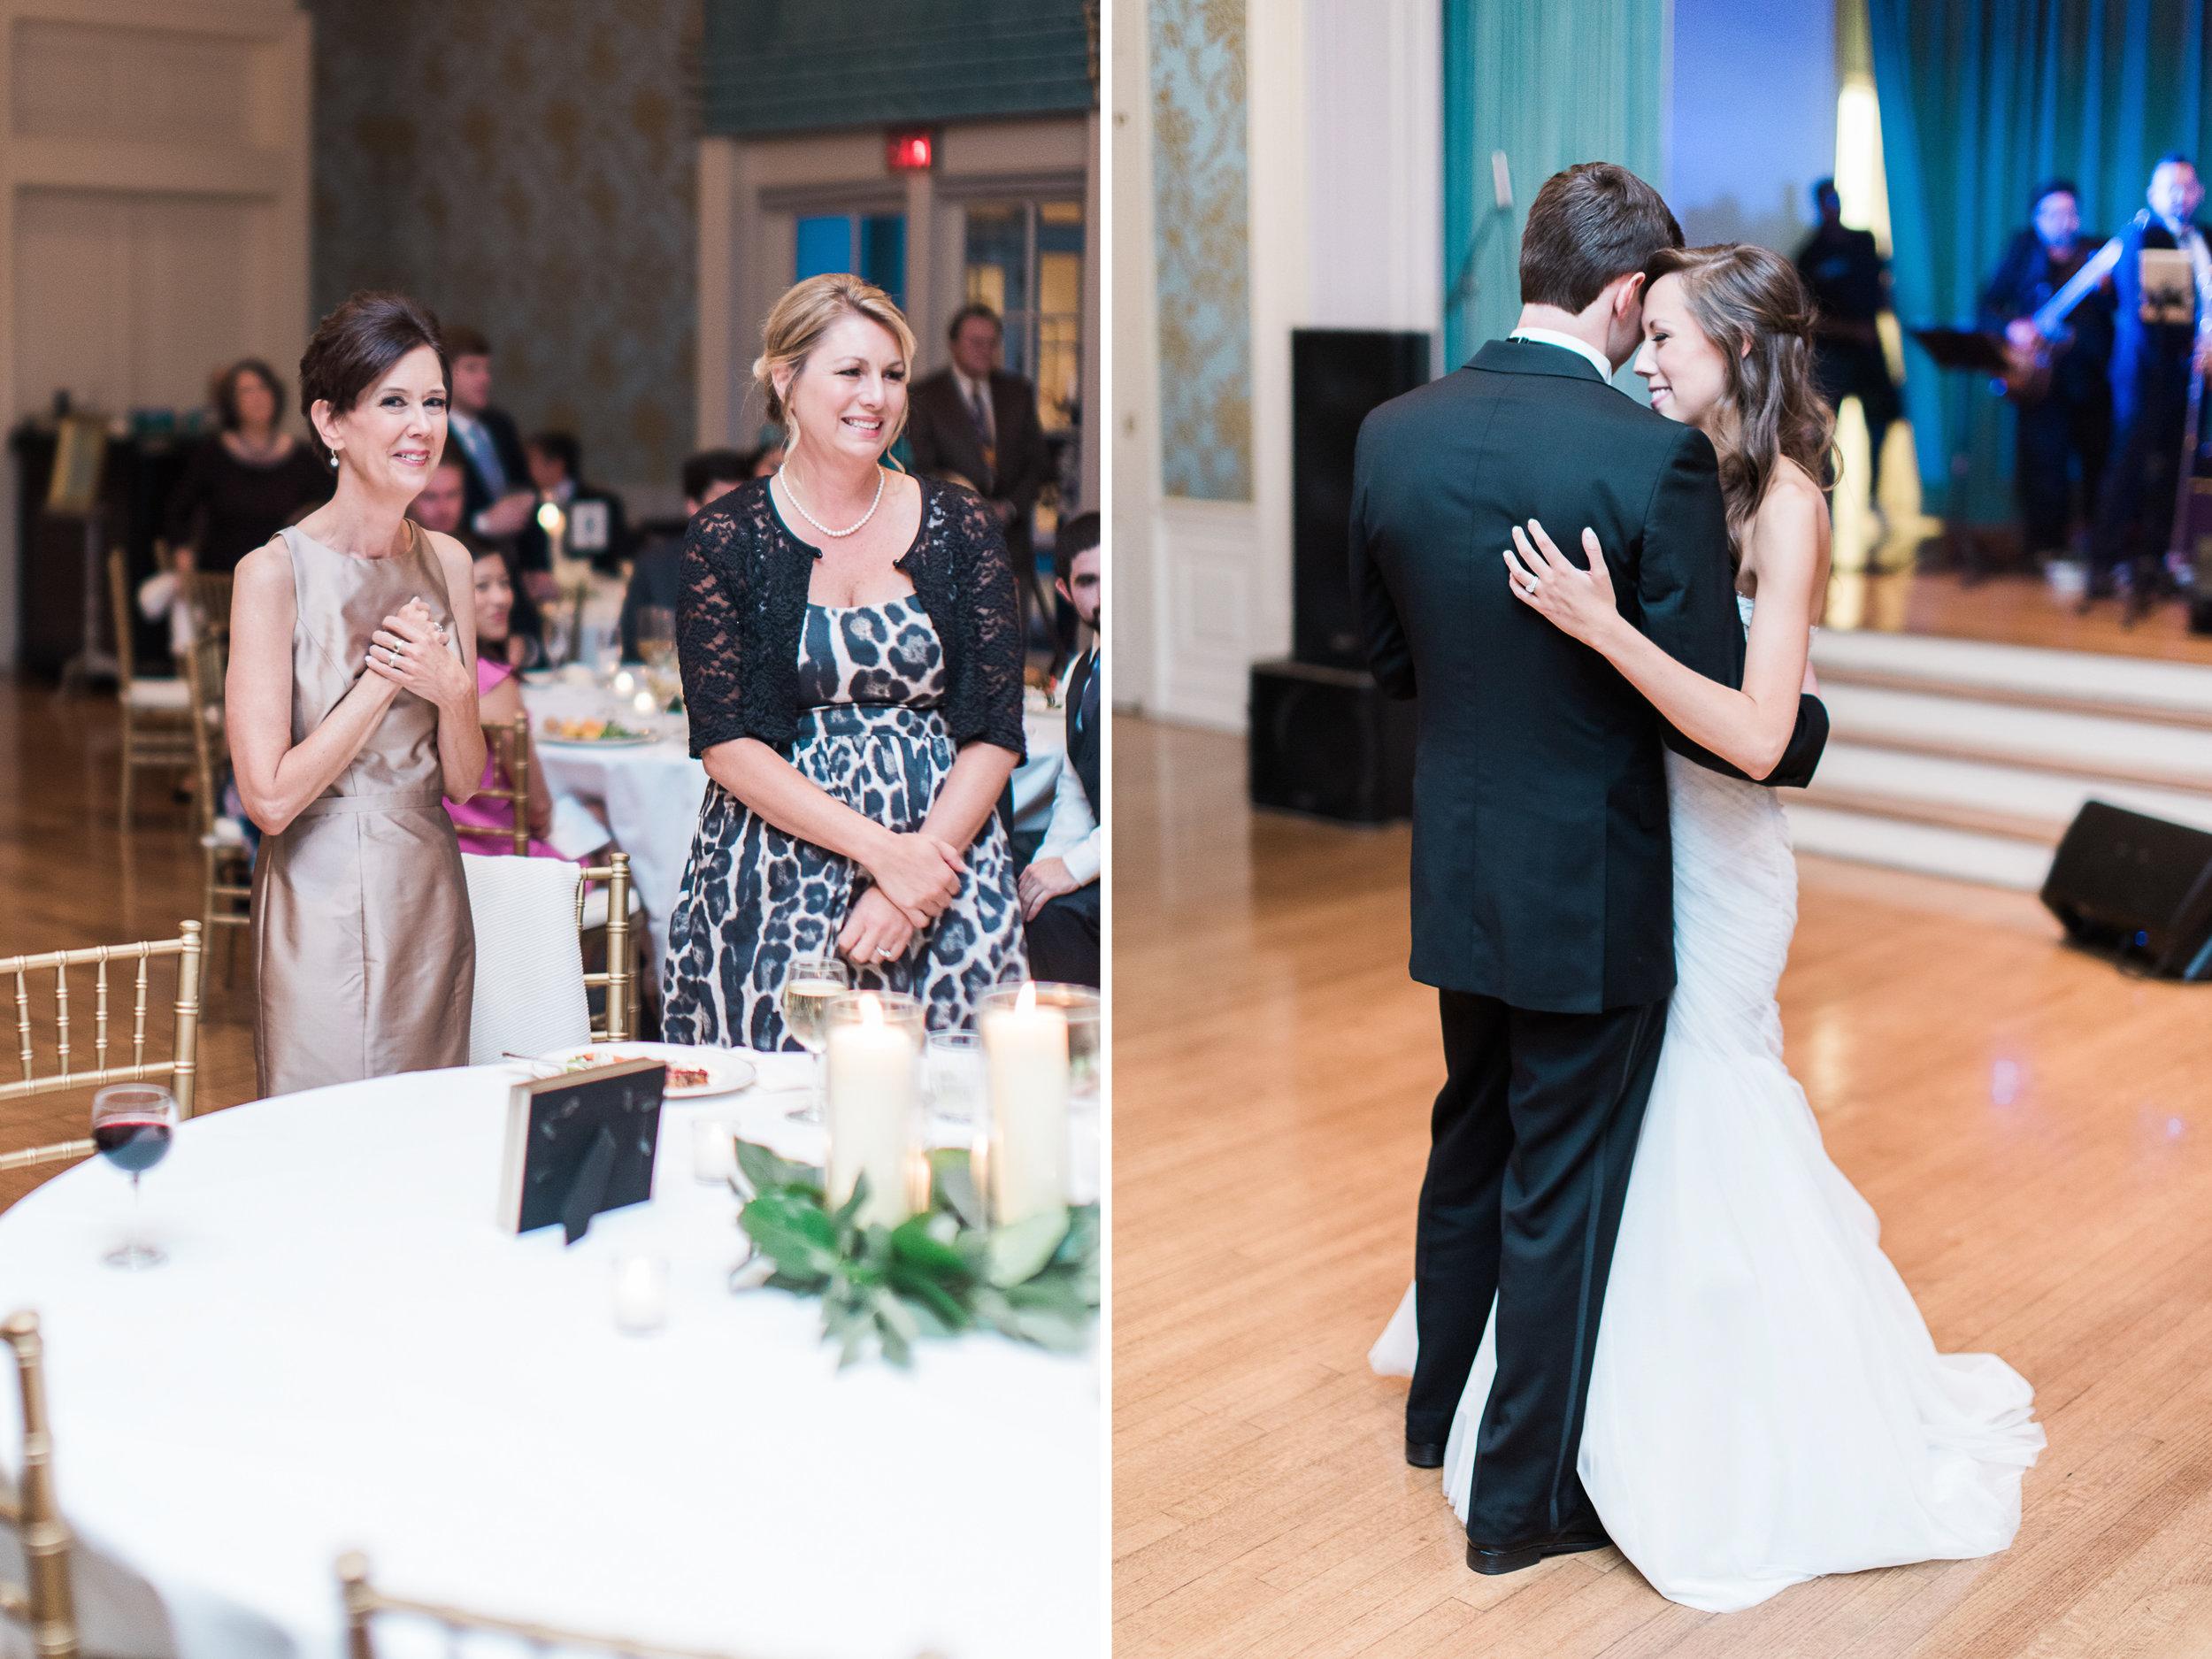 St.-Philip-Presbyterian-Church-Houston-Wedding-Ceremony-The-Junior-League-Of-Houston-Reception-Dana-Fernandez-Photography-Fine-Art-Film-161.jpg